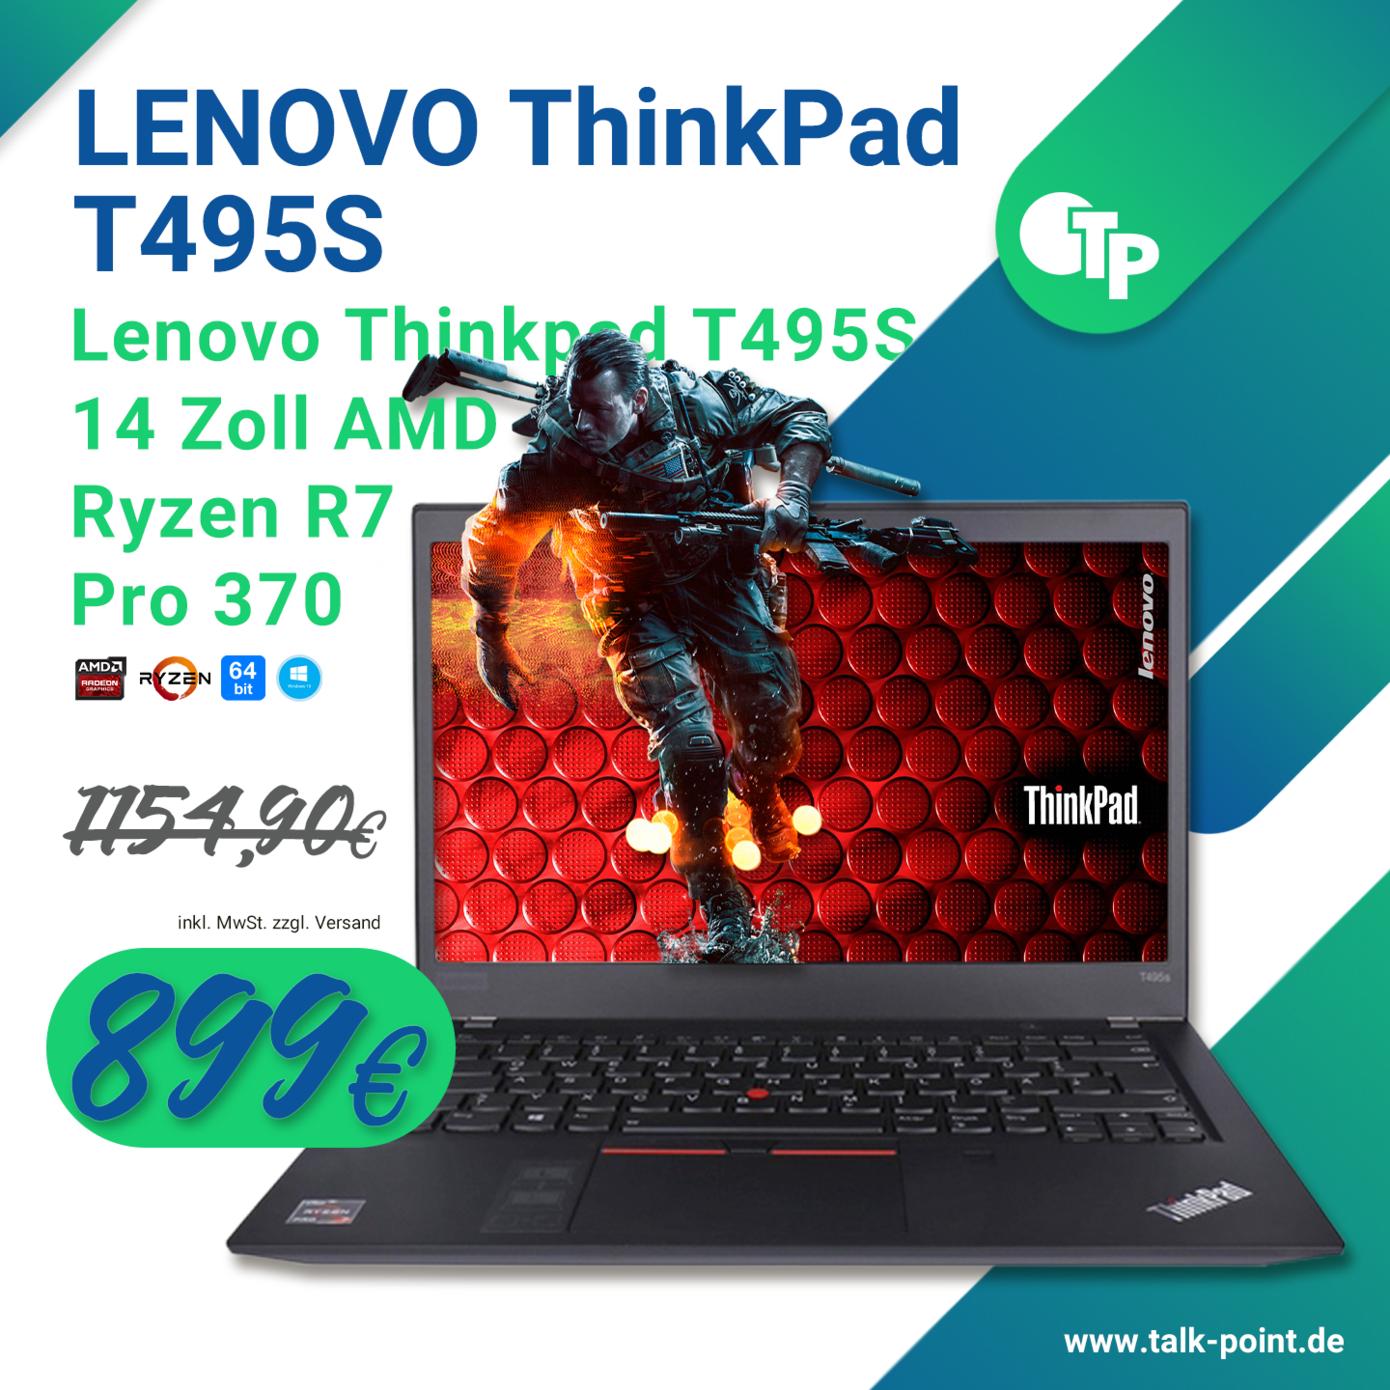 Lenovo Thinkpad T495S 14 Zoll AMD Ryzen R7 Pro 370, 16GB RAM, 512GB SSD